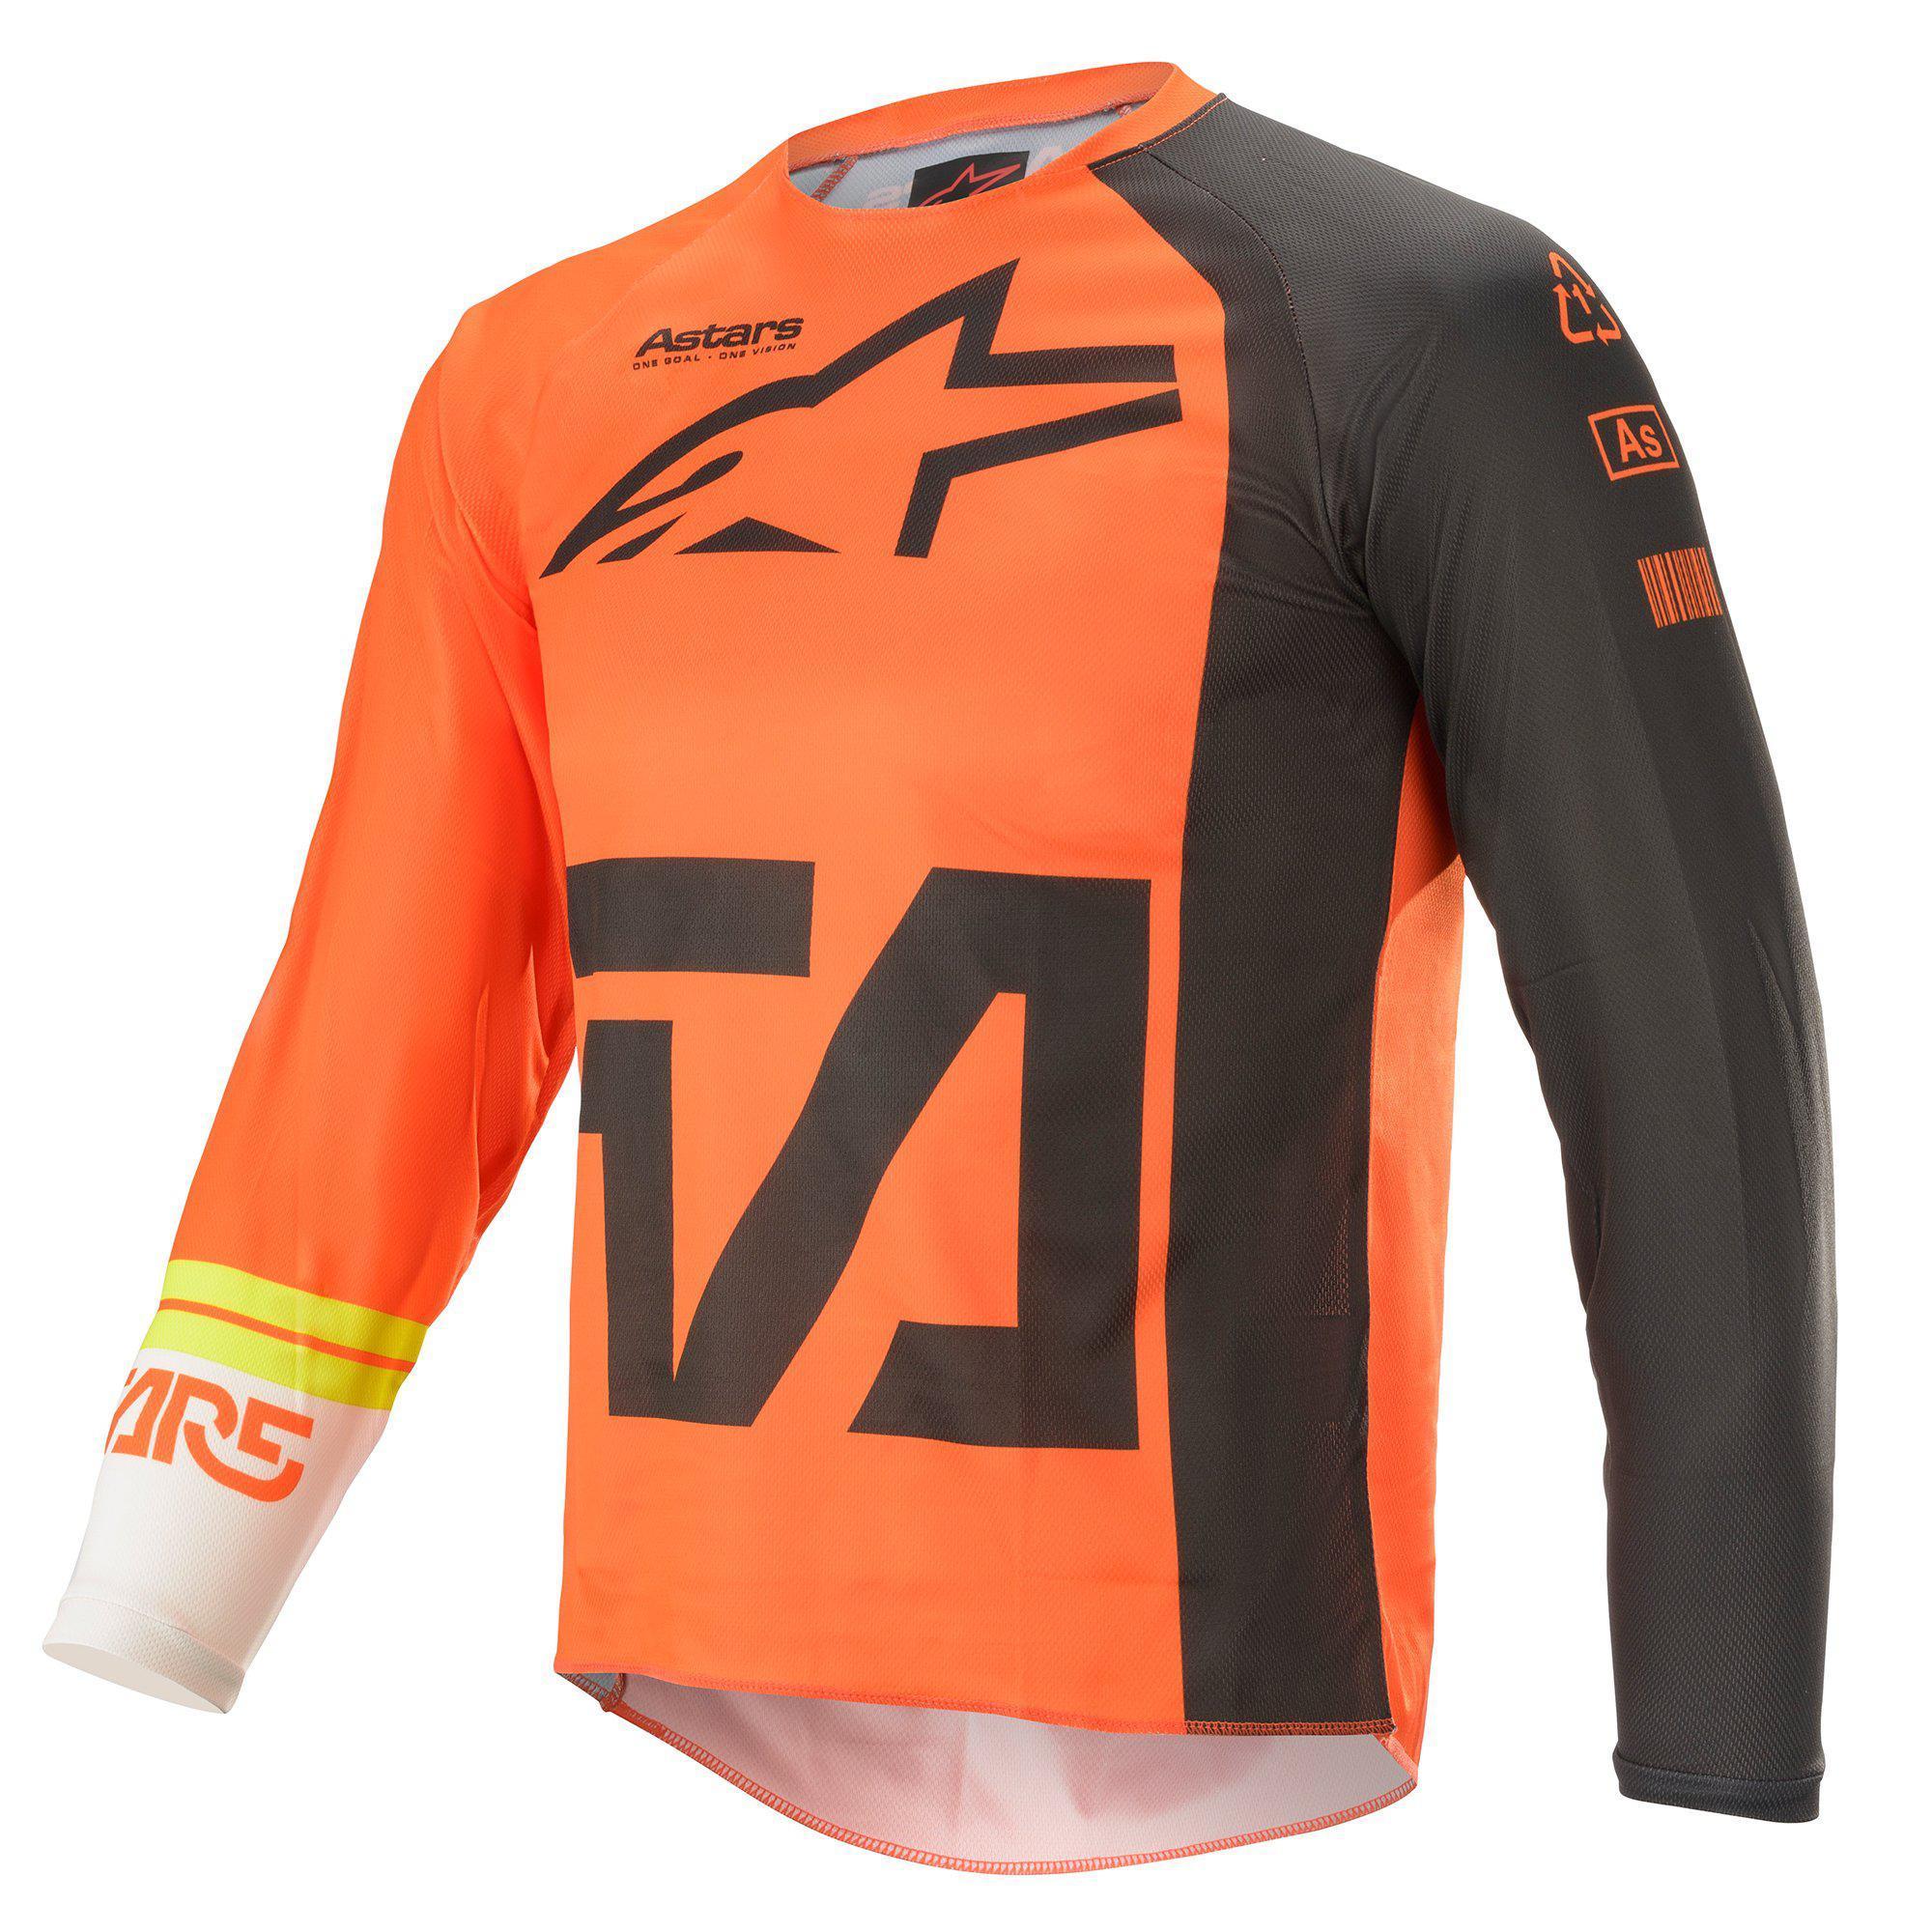 Alpinestars 2021 Youth Racer Compass Orange/Anthracite/White Jersey